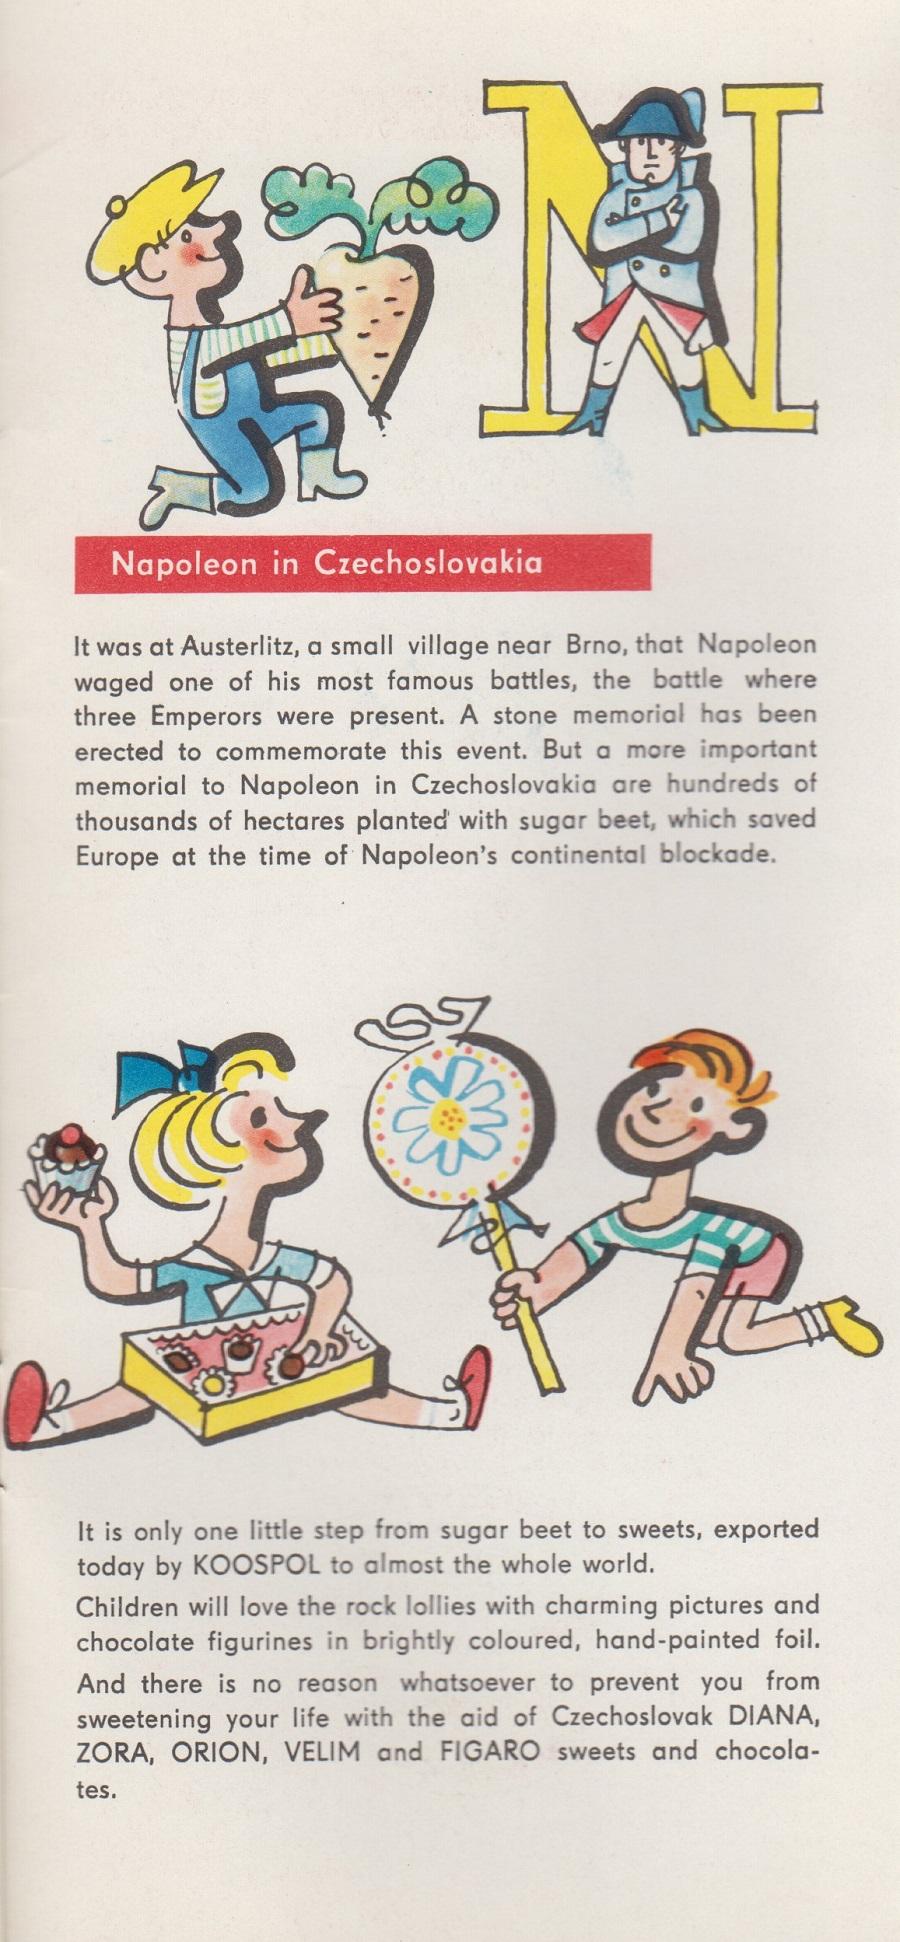 World Famous Recipes of Czechoslovak Specialties